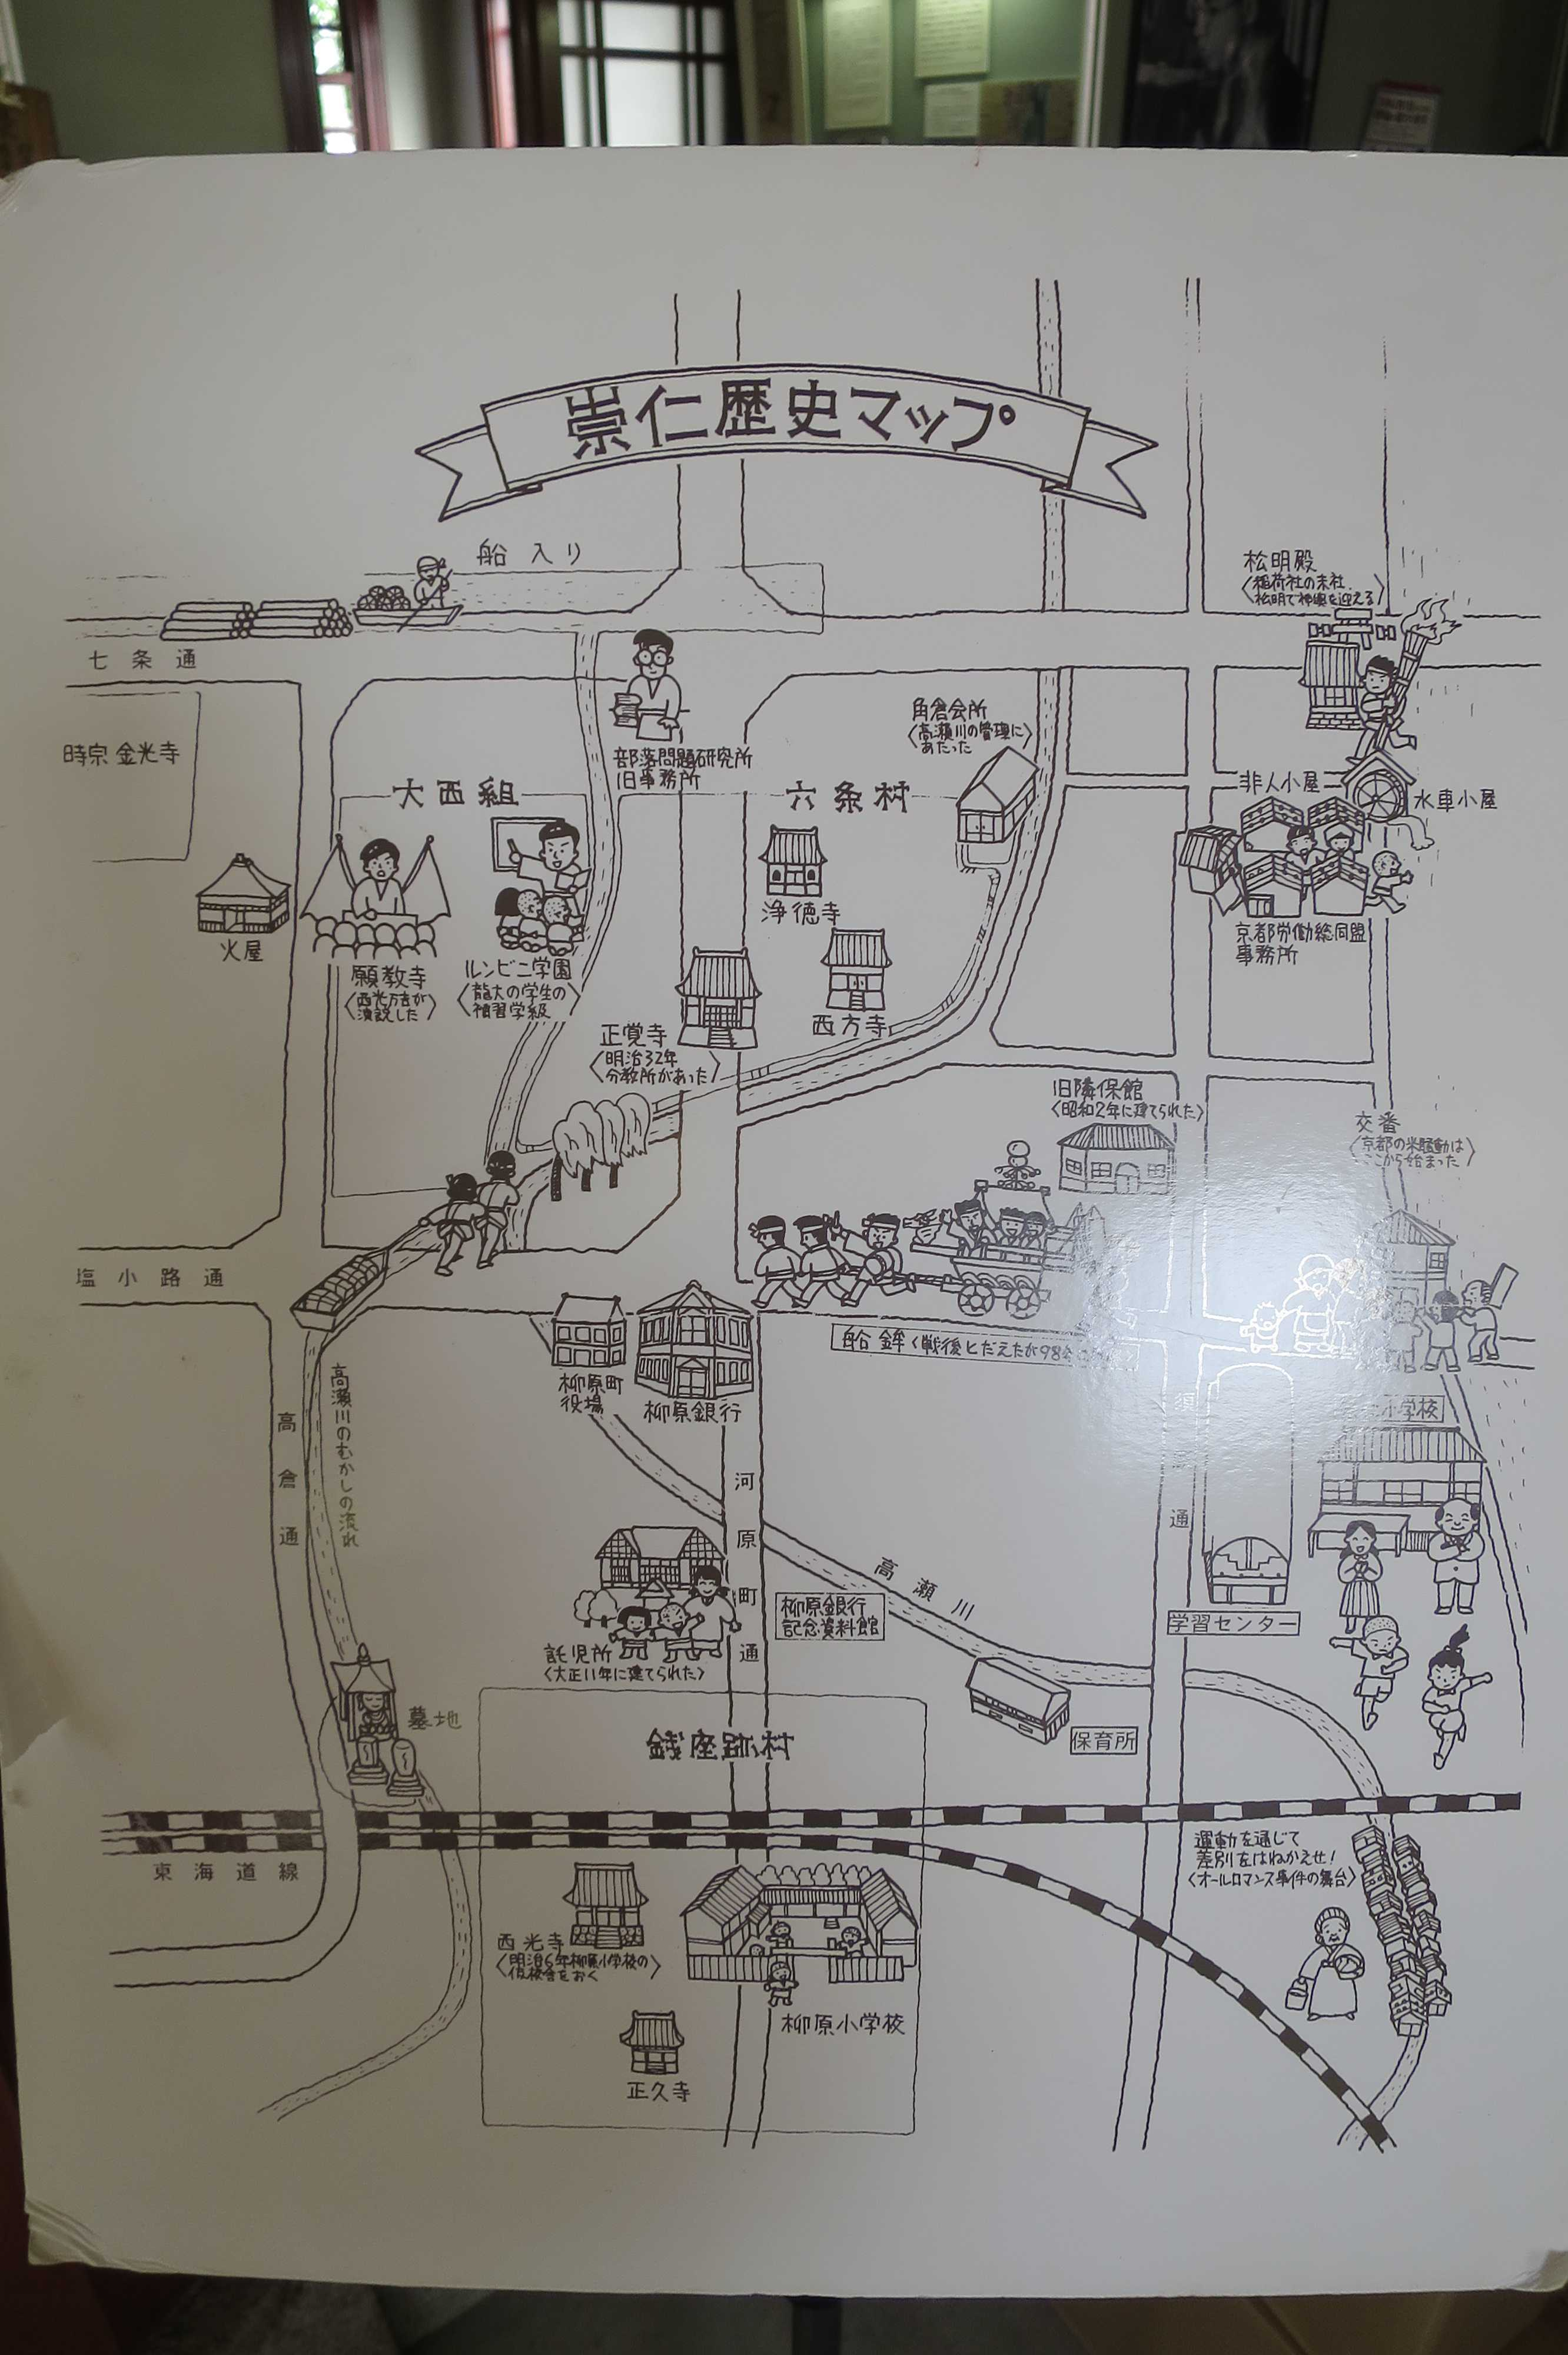 京都・崇仁地区 - 崇仁歴史マップ